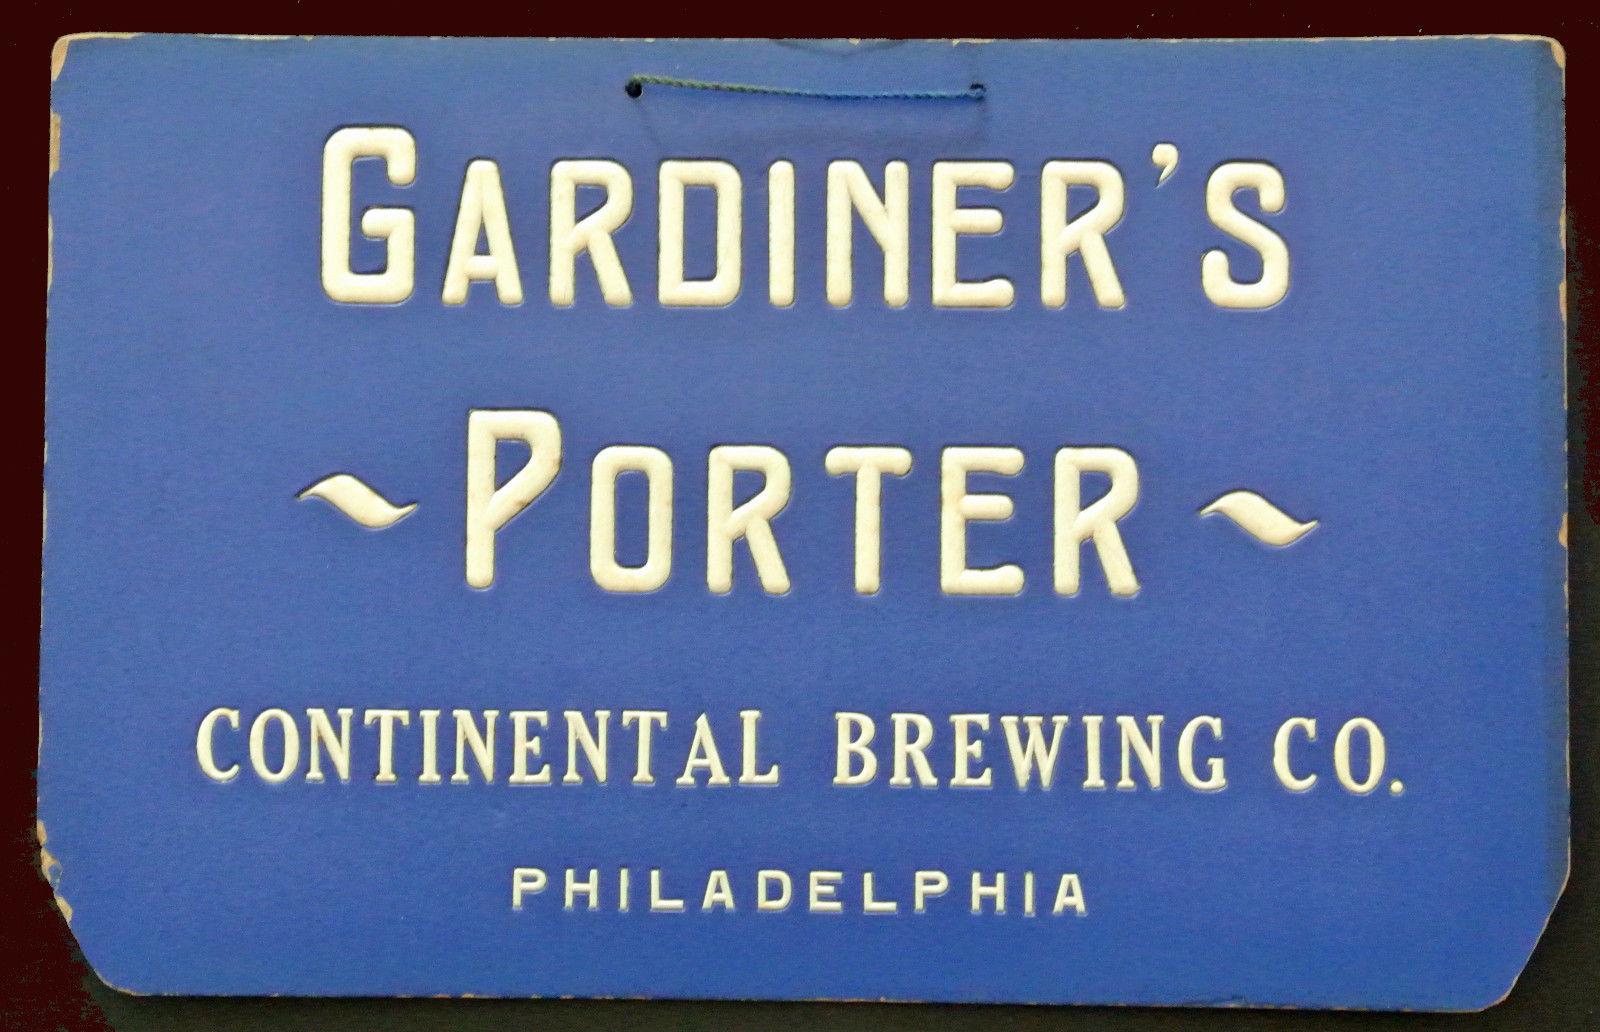 Pre pro continental brewing company sign gardiner s for Pre porter website